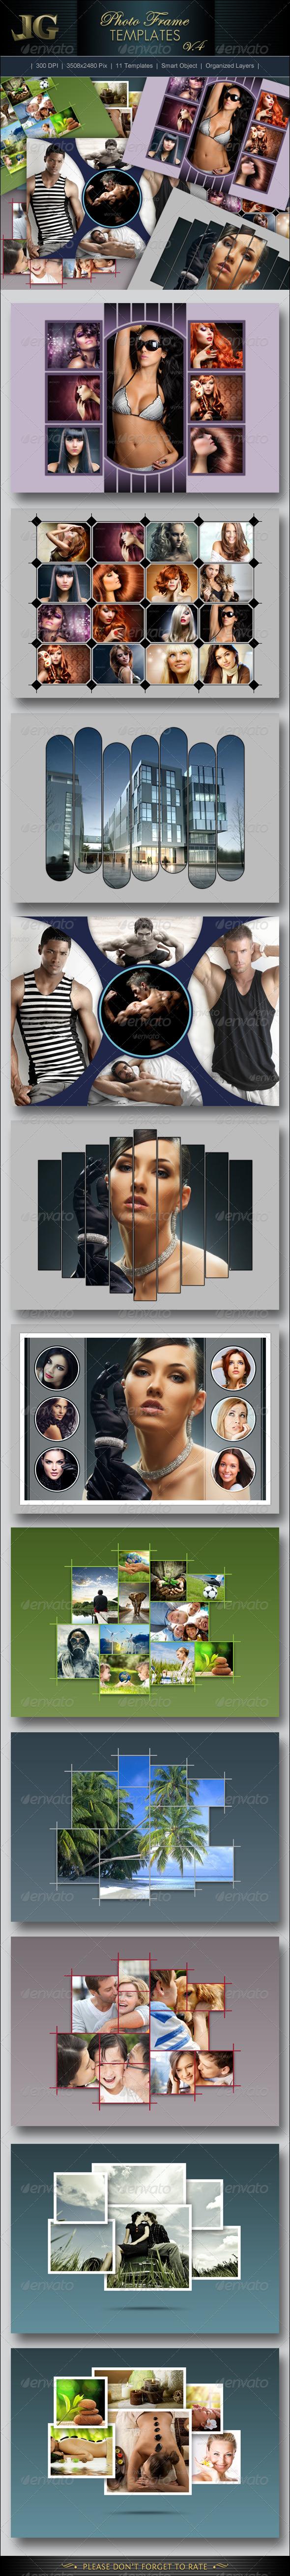 Photo Frames V4 - Artistic Photo Templates